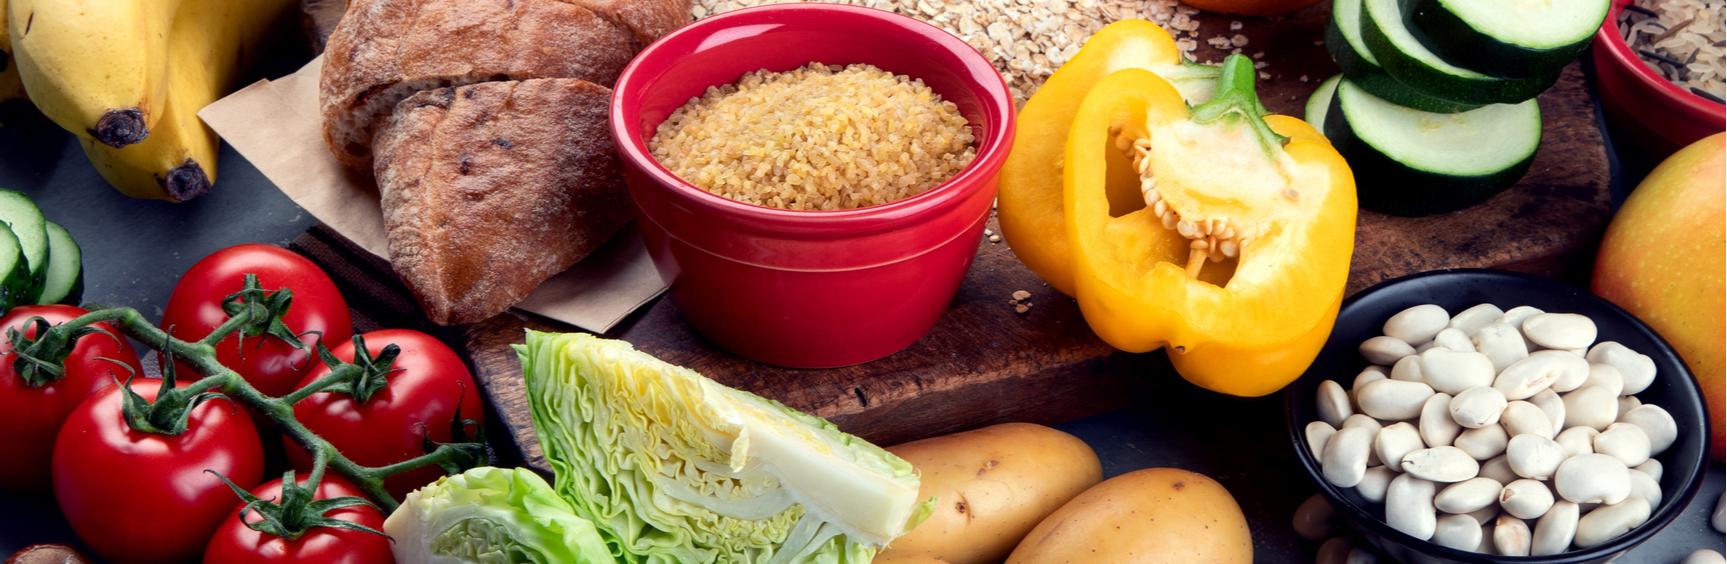 improve your diet